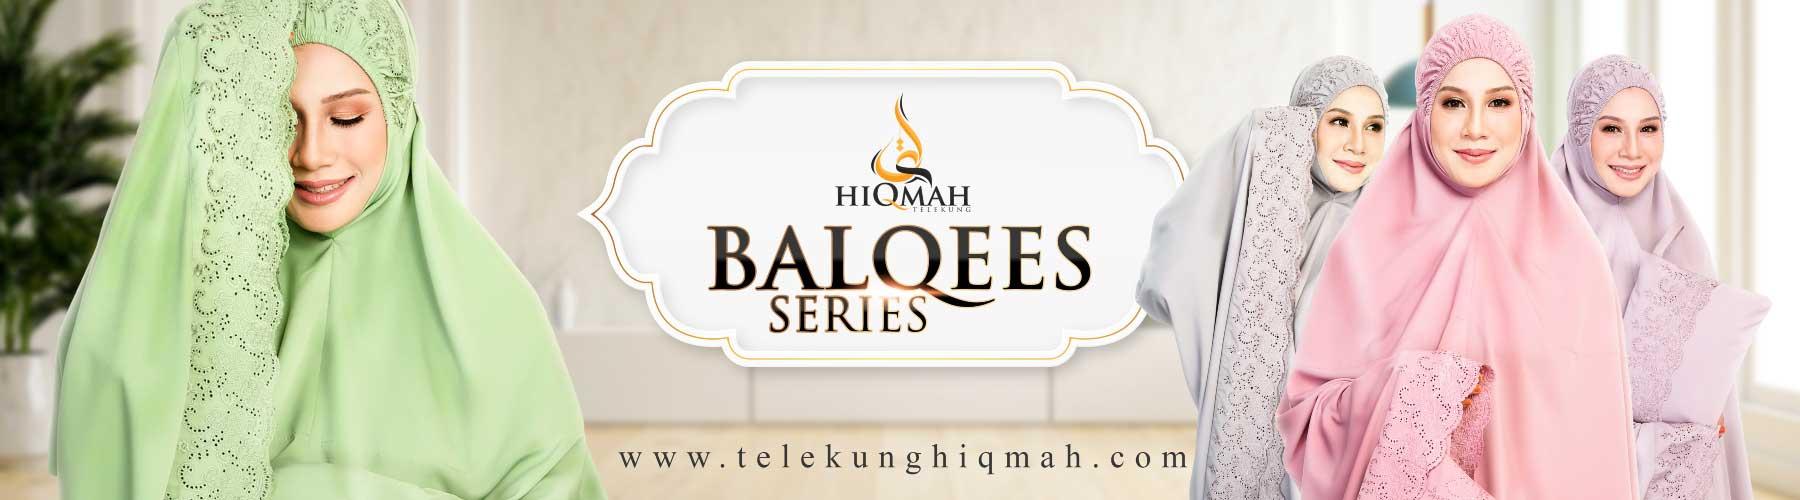 Balqess Series